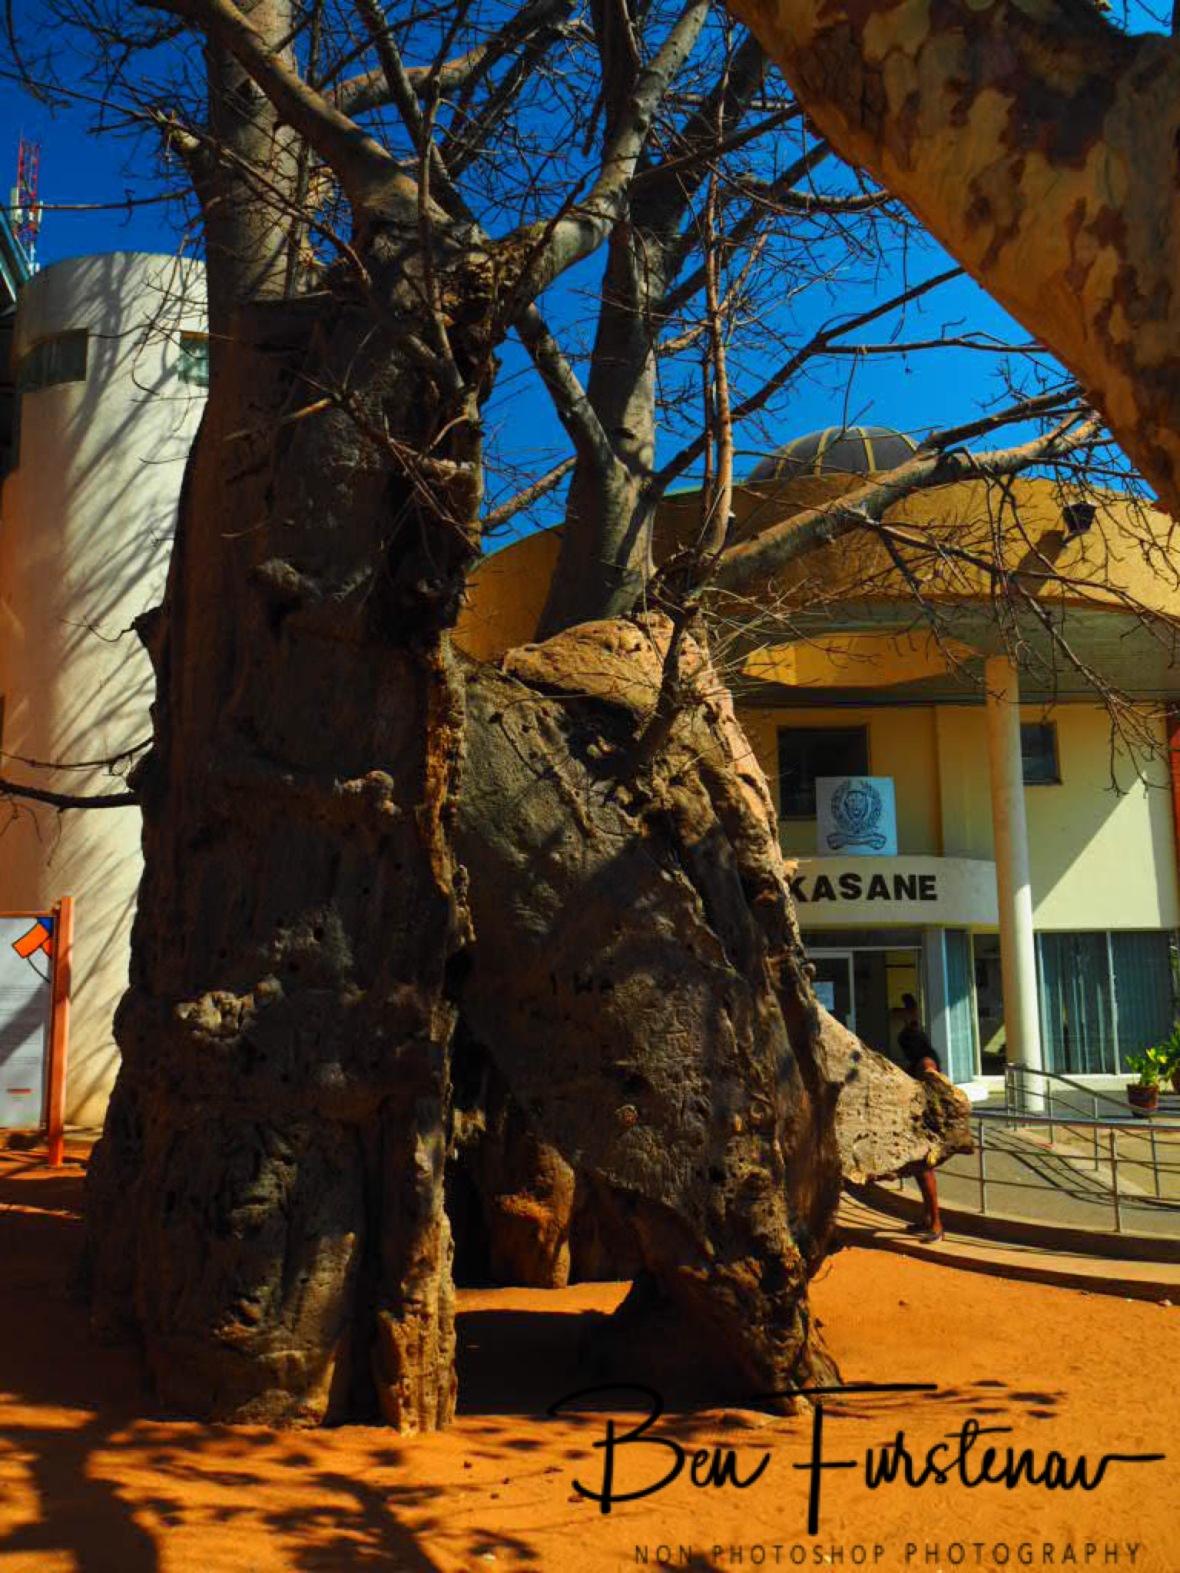 Holy and hollow Baobab prison at Kasane police station, Botswana